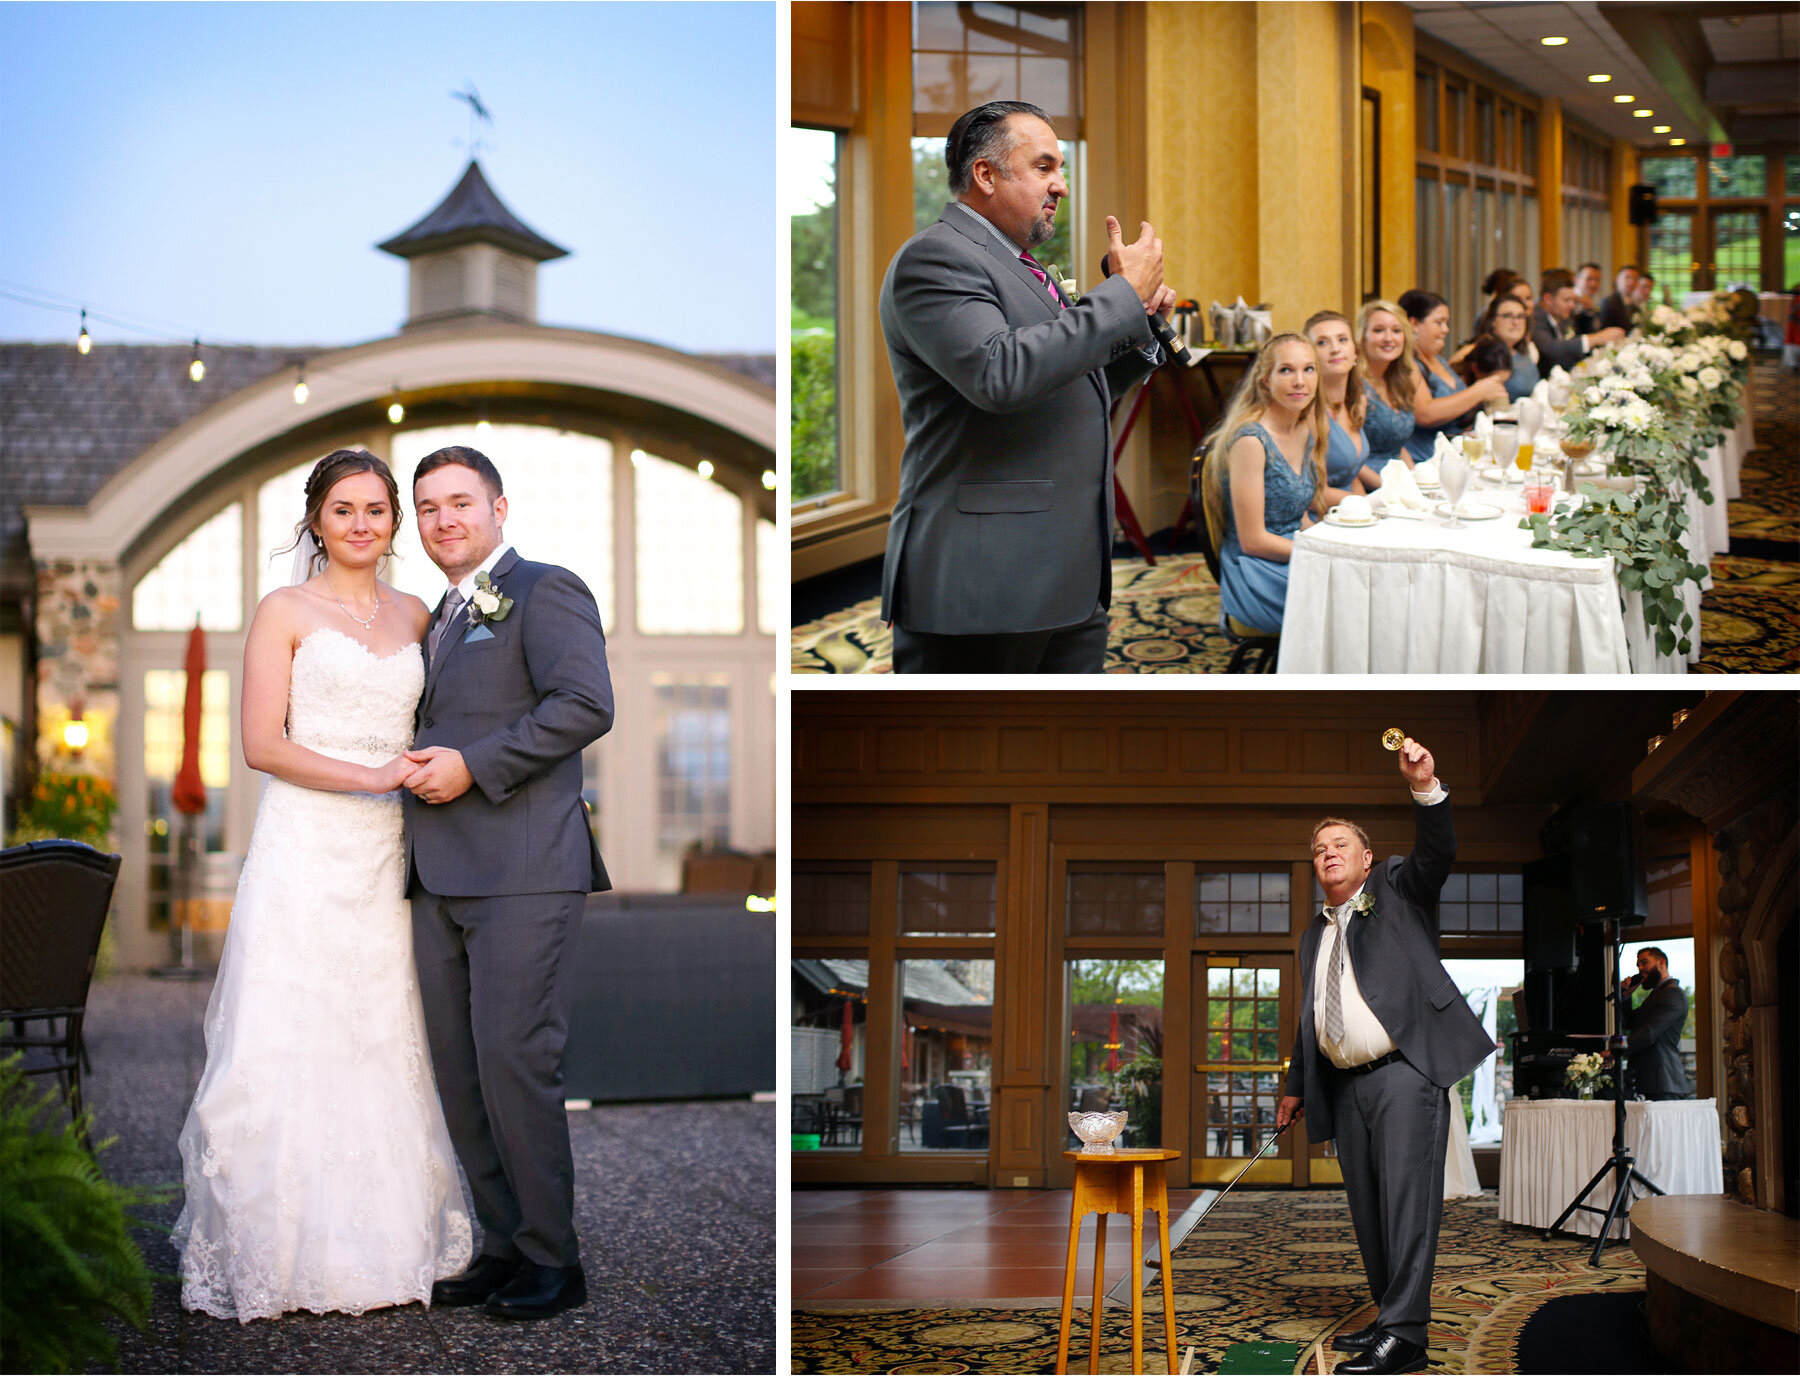 17-Vick-Photography-Minneapolis-Minnesota-Wedding-Rush-Creek-Golf-Club-Reception-Toasts-Amanda-and-Michael.jpg